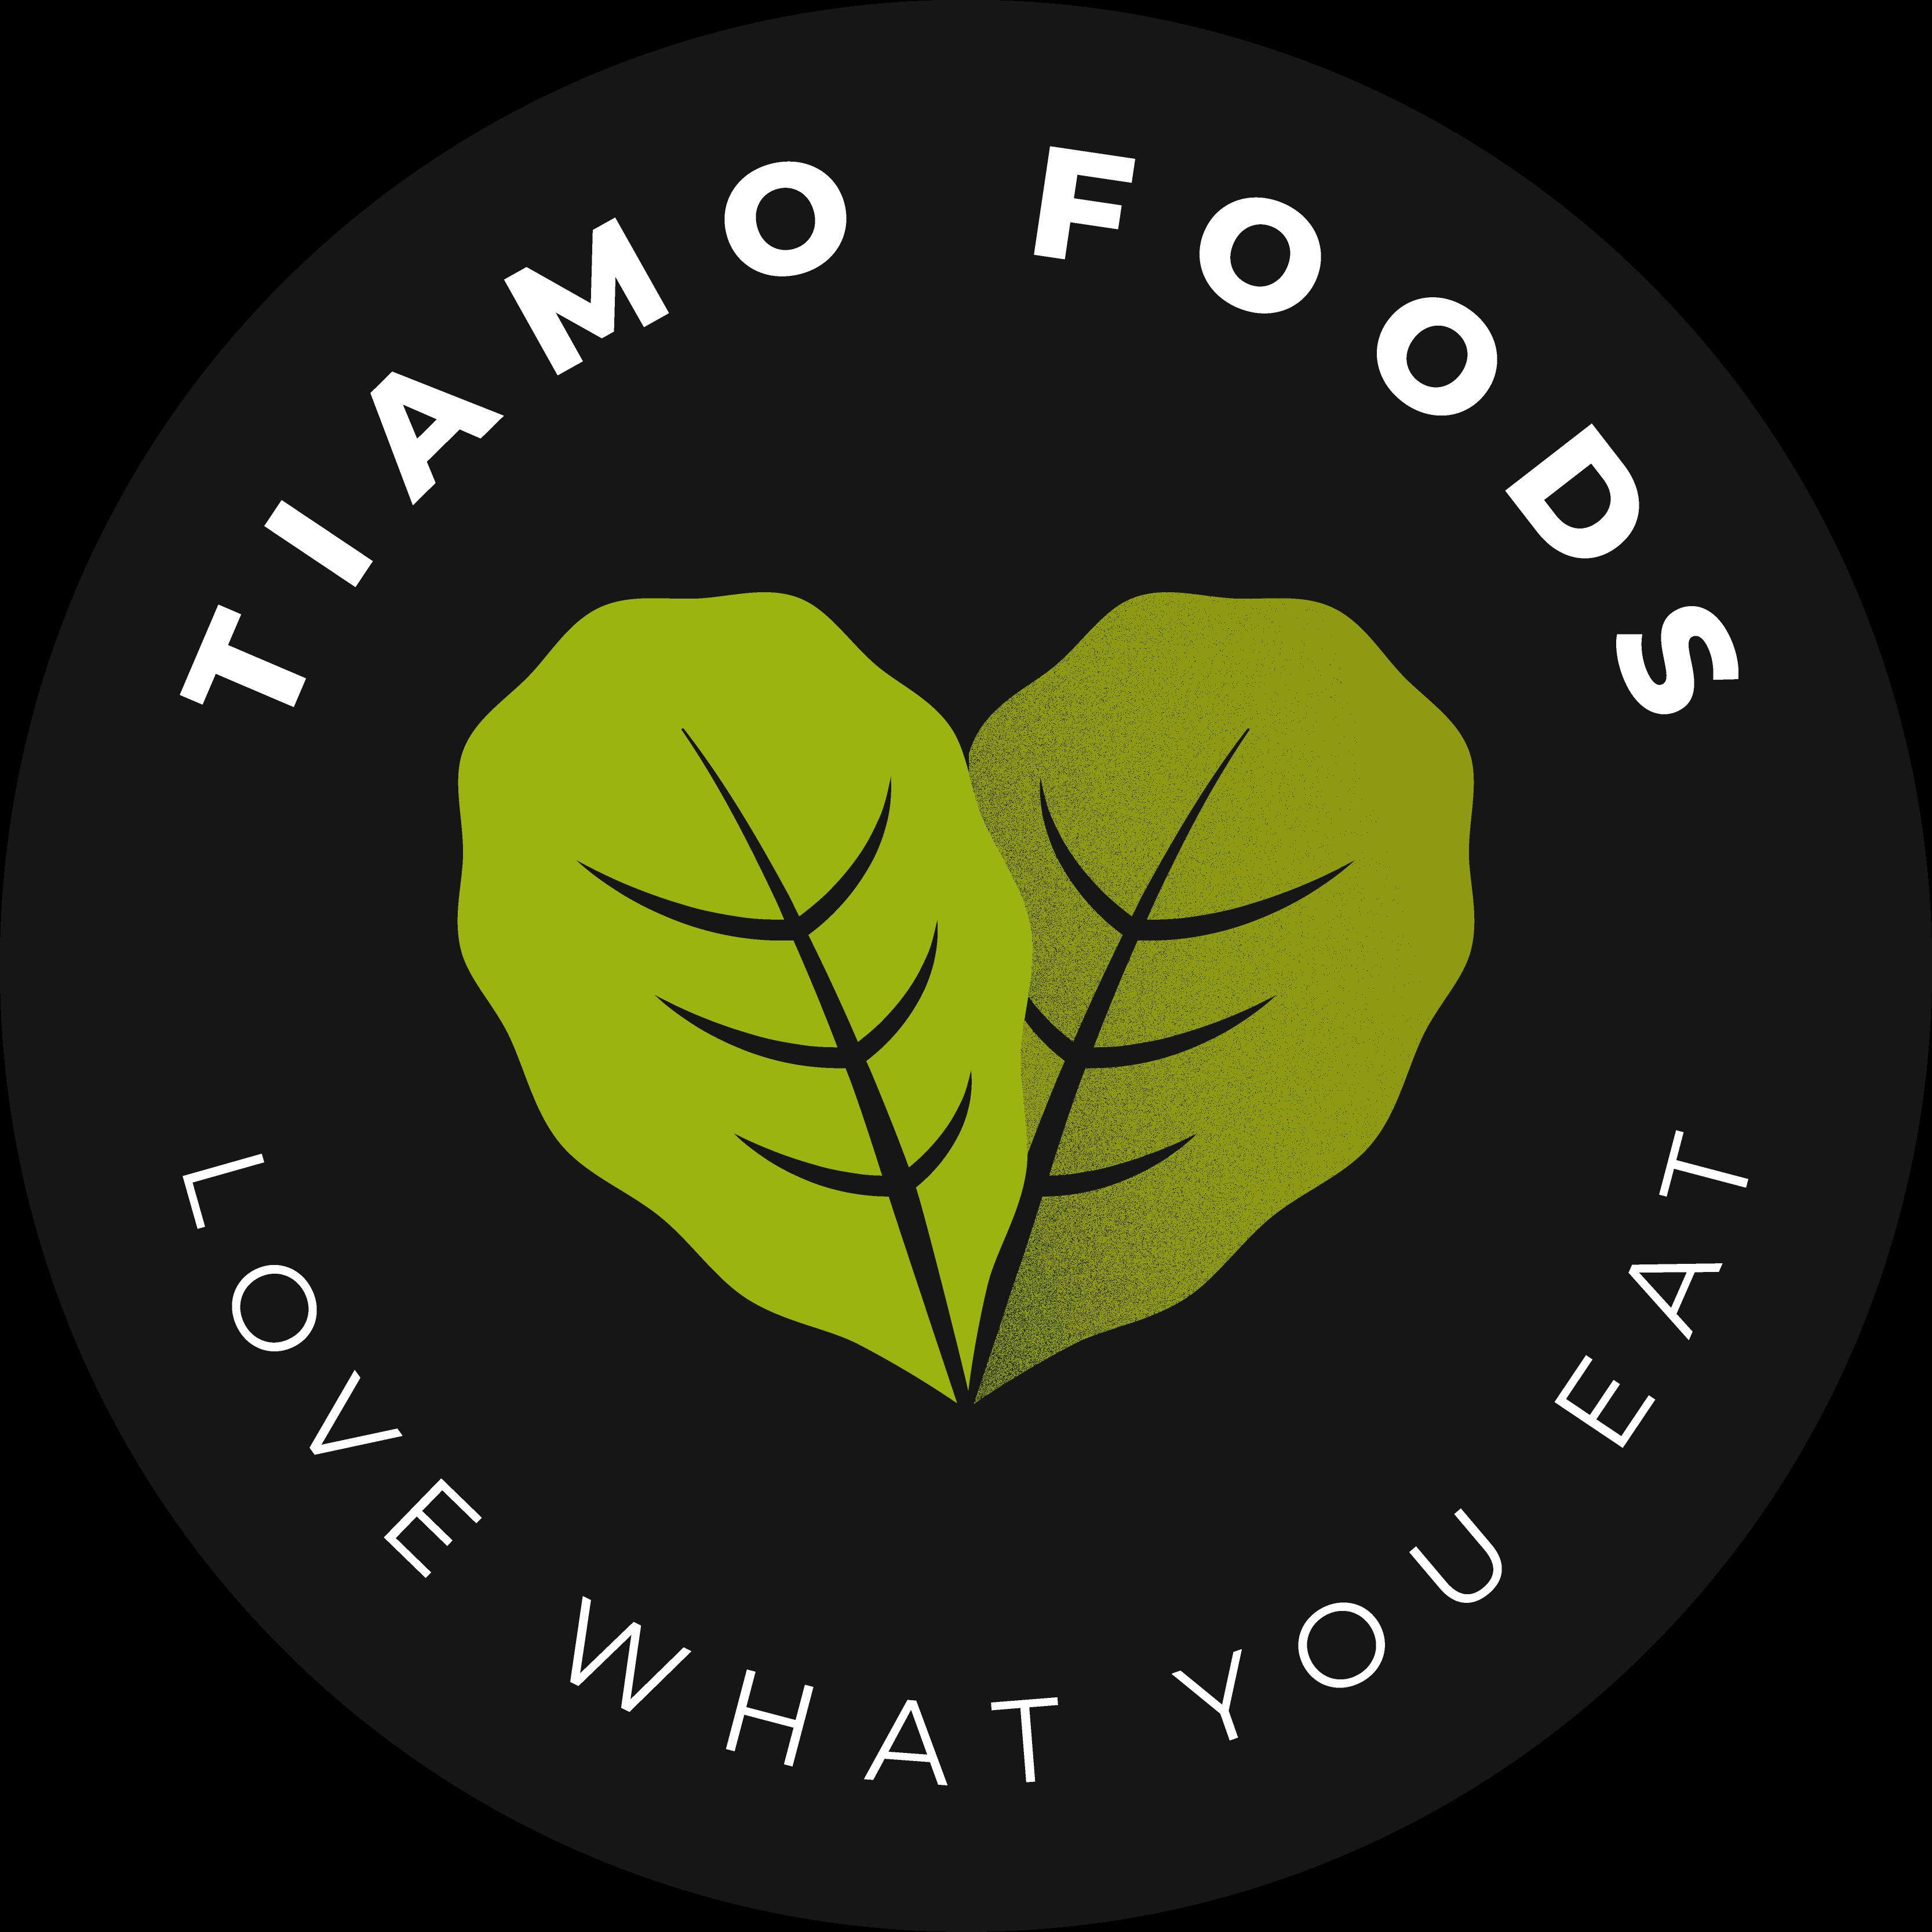 Tiamo Foods